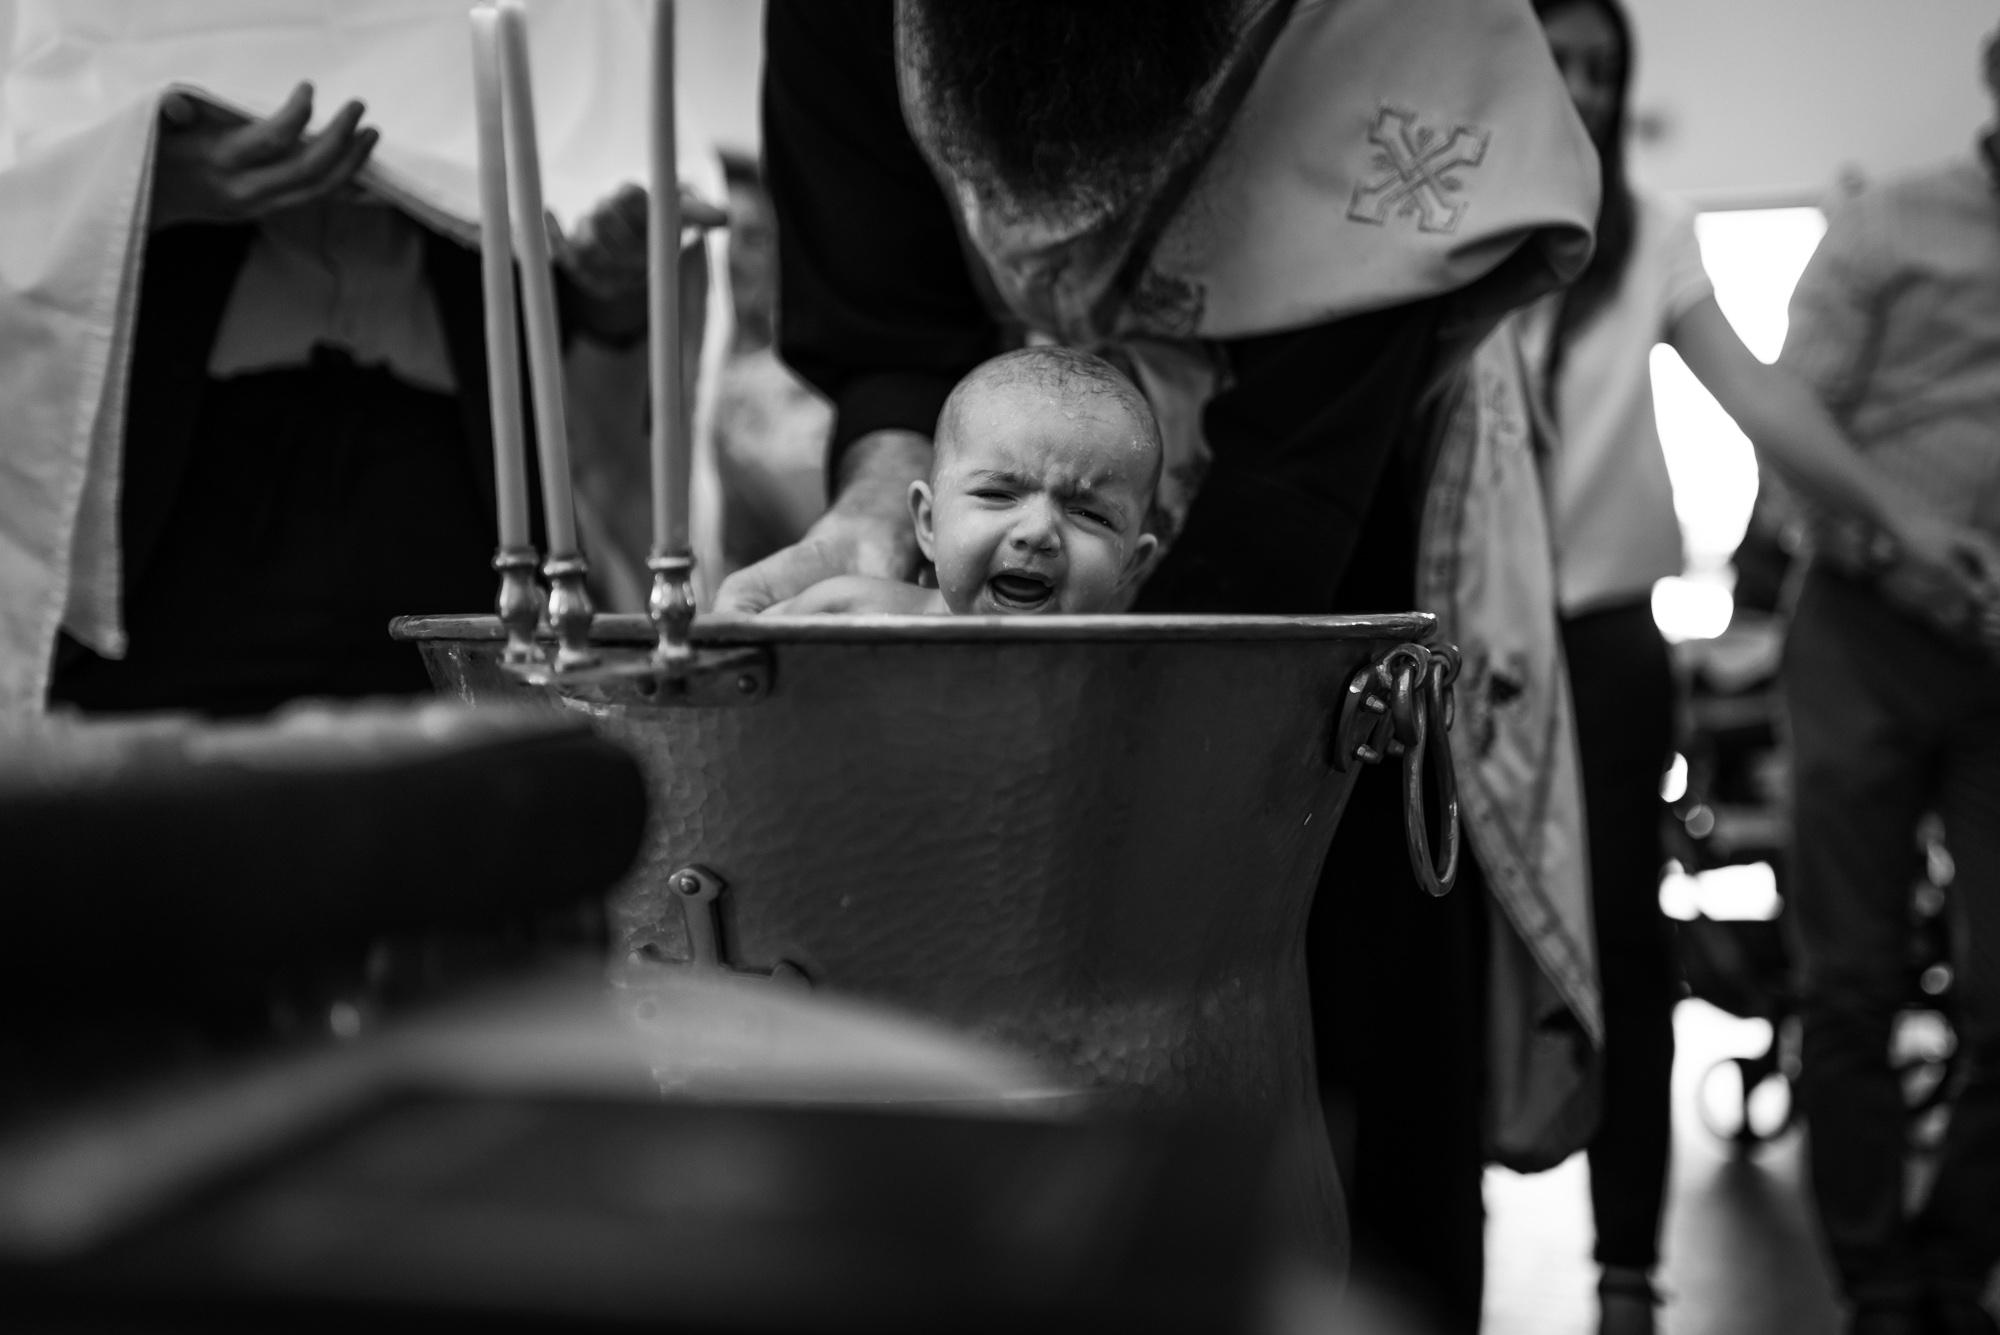 Christening cyprus βαπτιση  κυπρος the bath.jpg